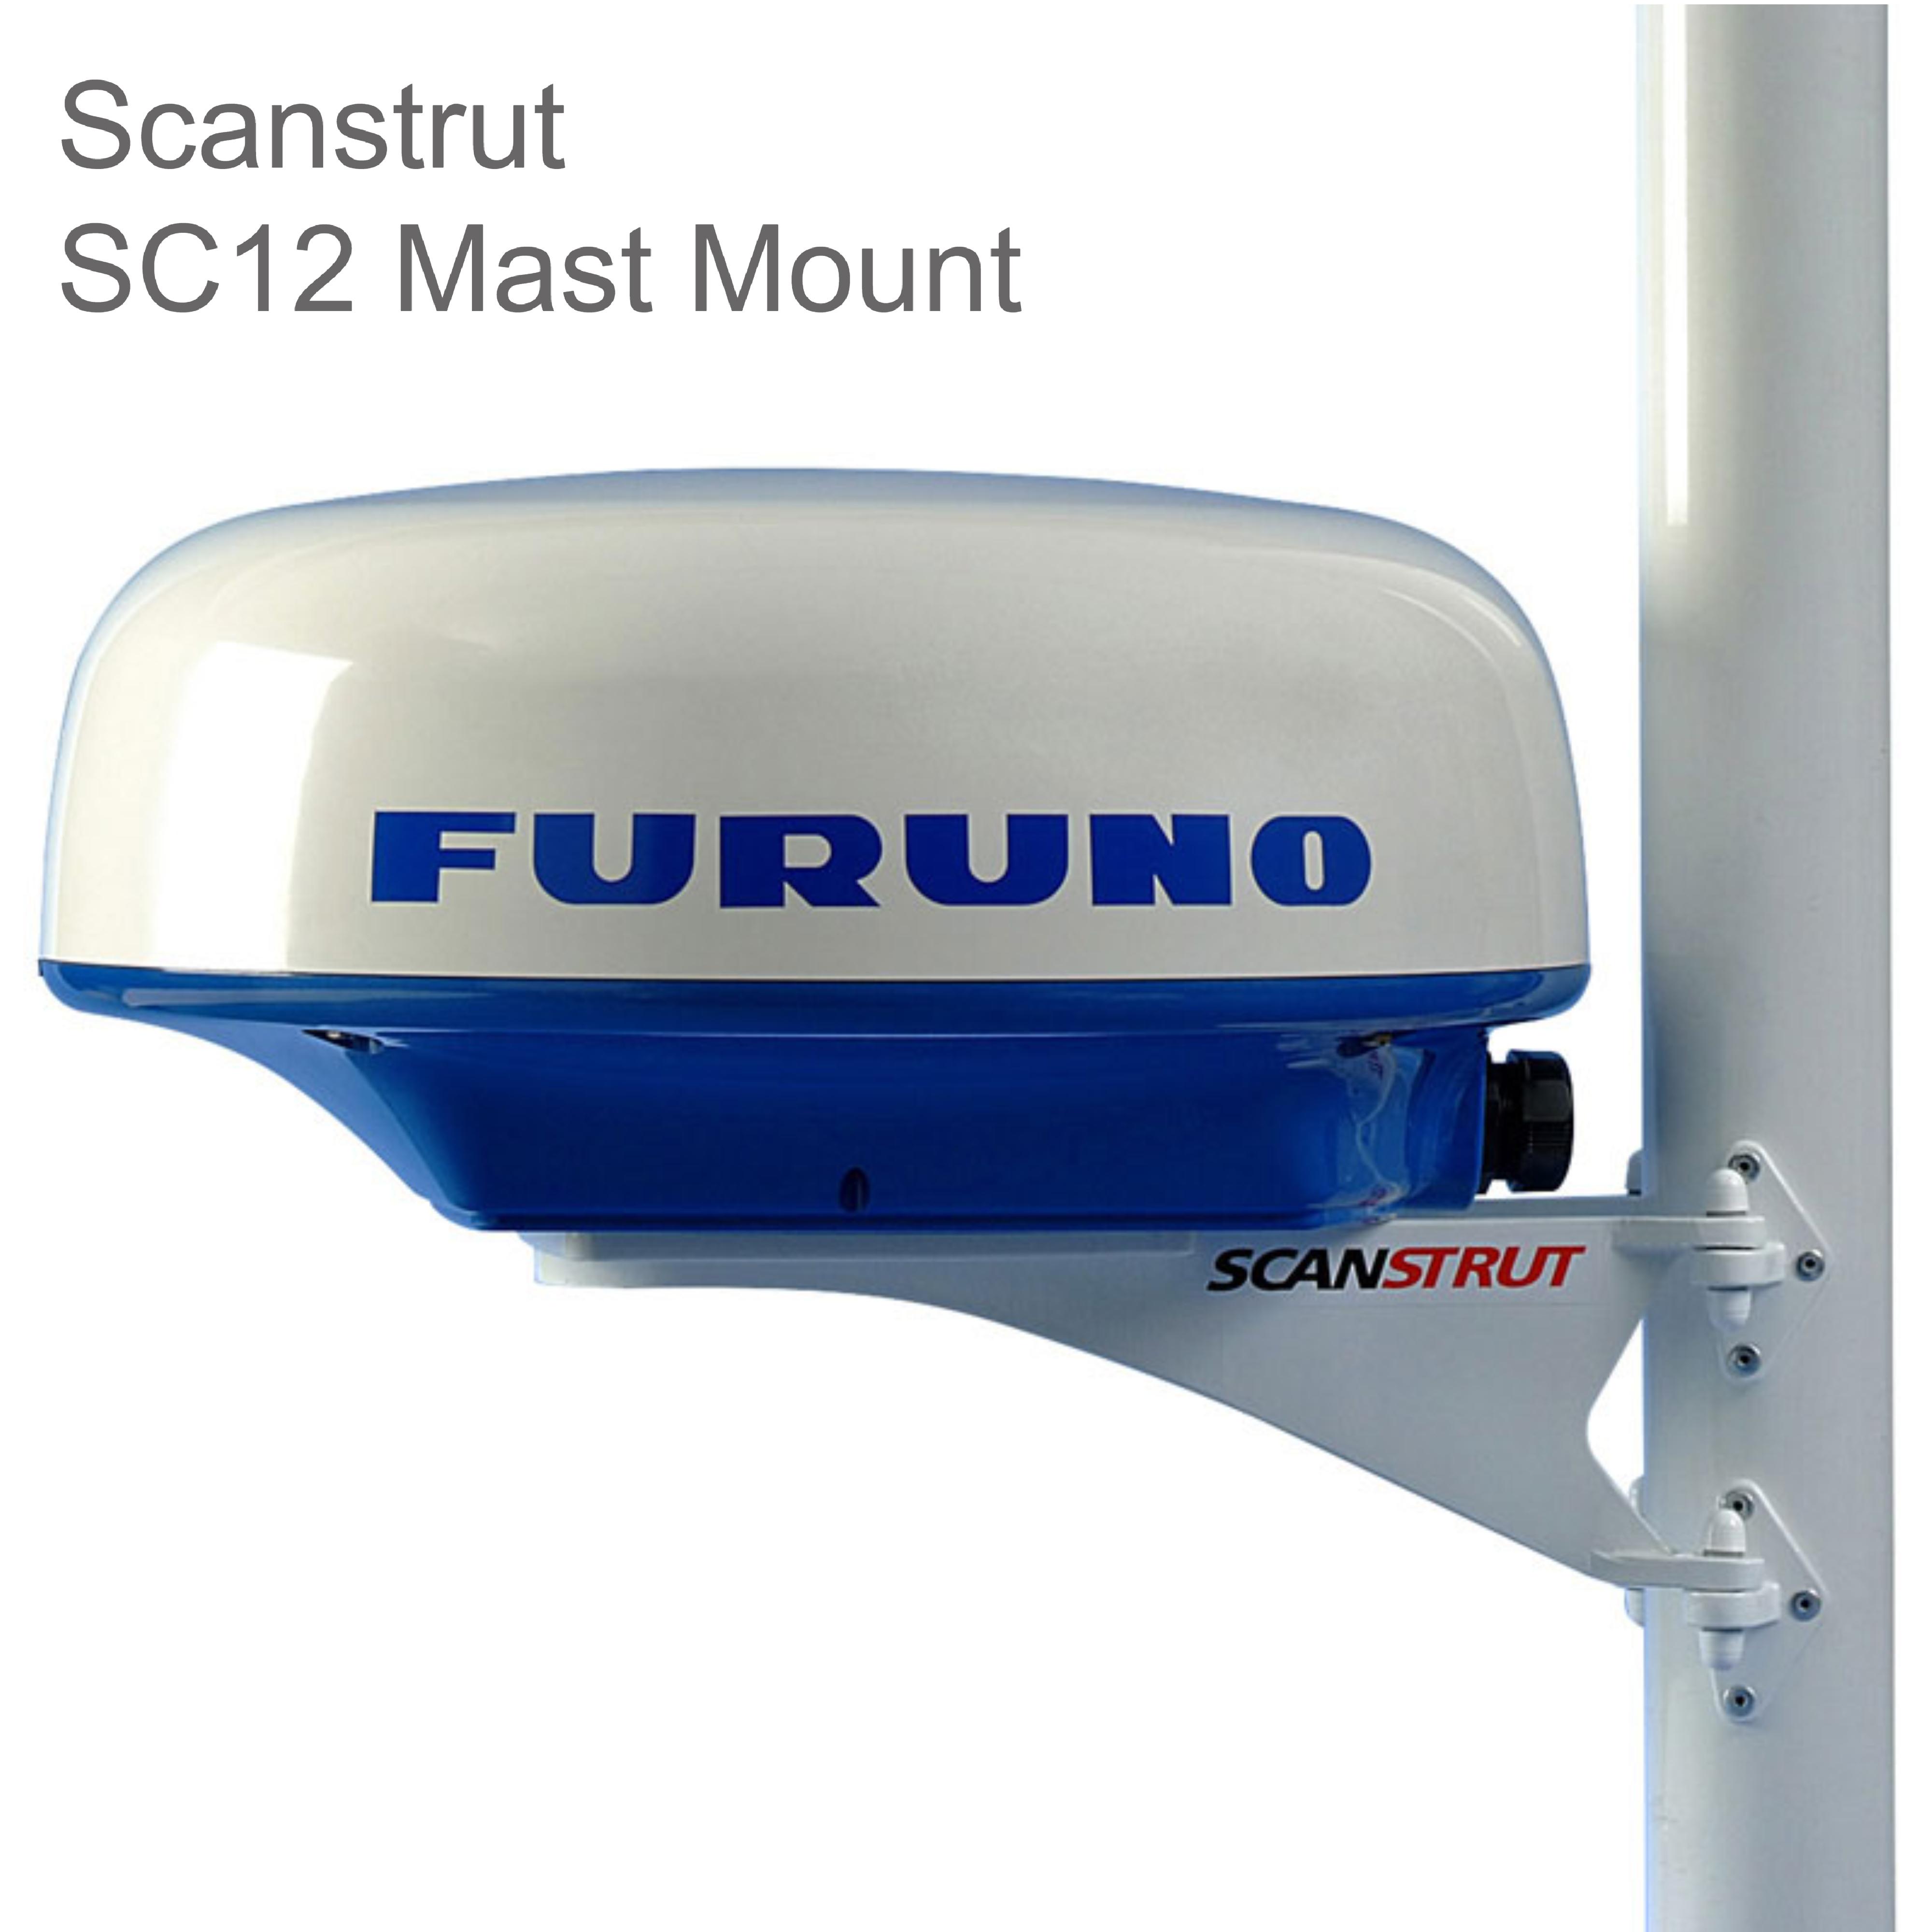 Scanstrut SC12 Mast Mount Platform For Radome & Small Satcom/TV Antenna - Medium